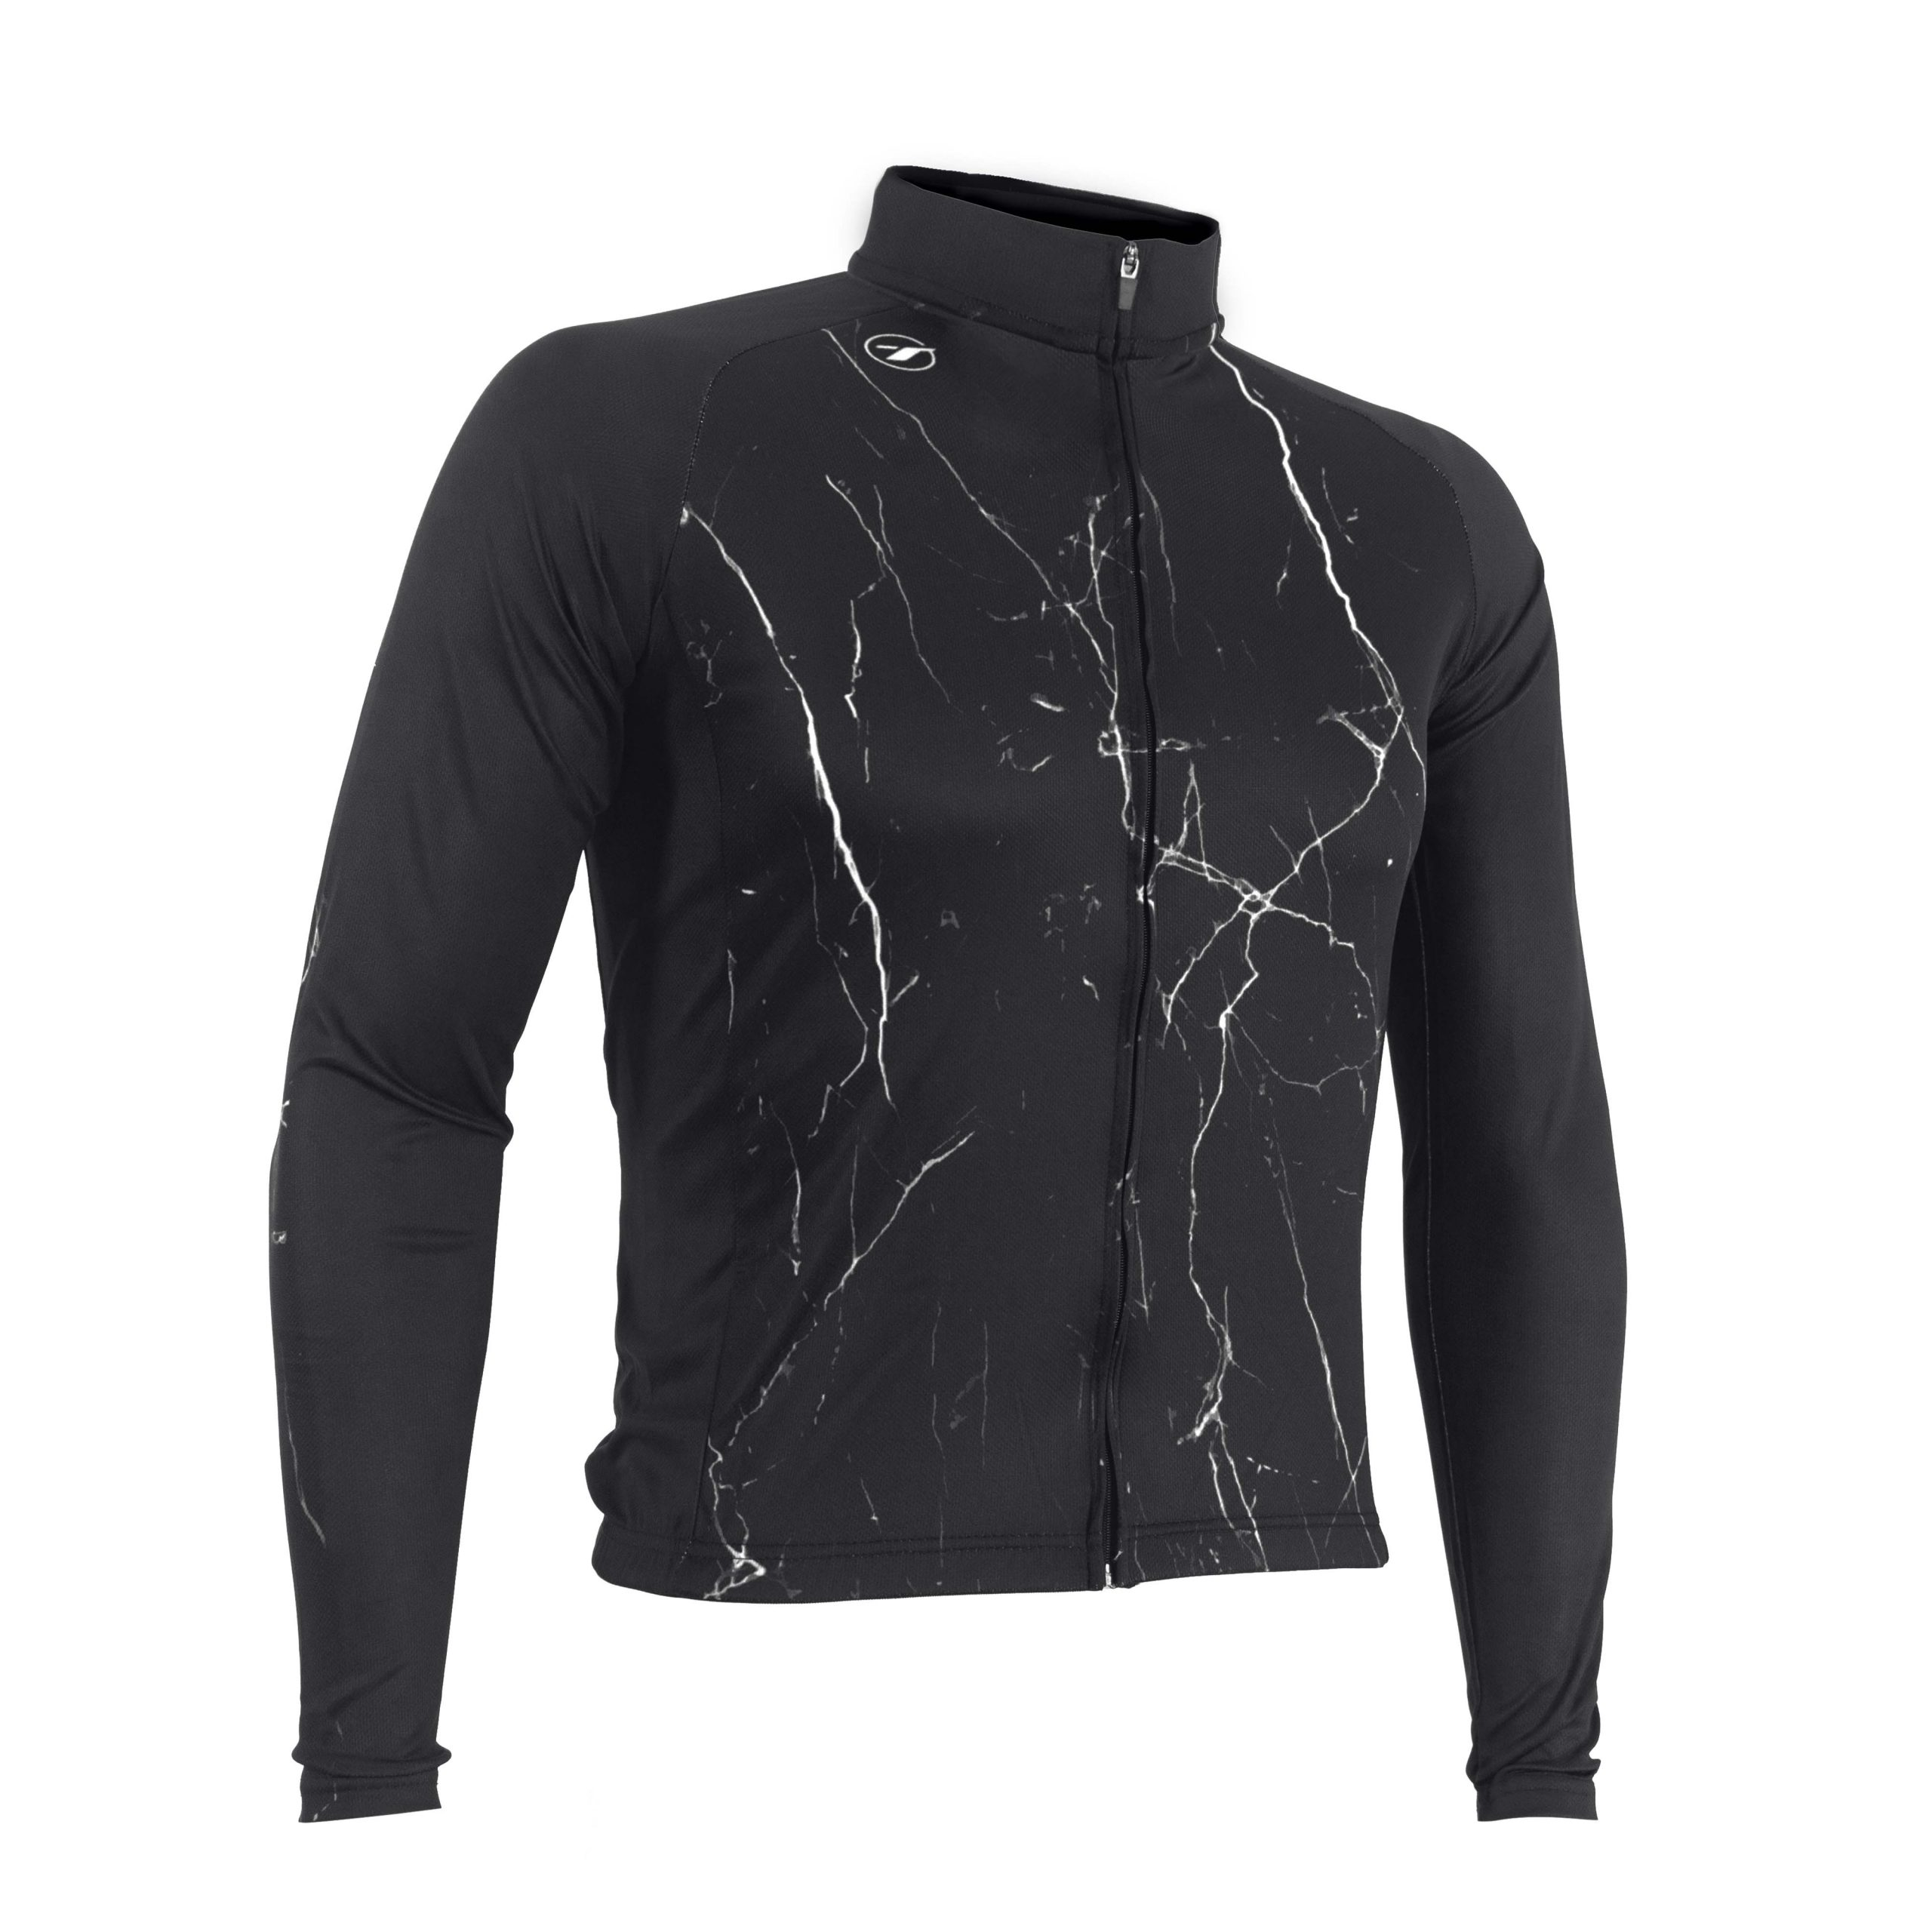 Camisa manga longa para ciclismo STORM | PRO LINE 7